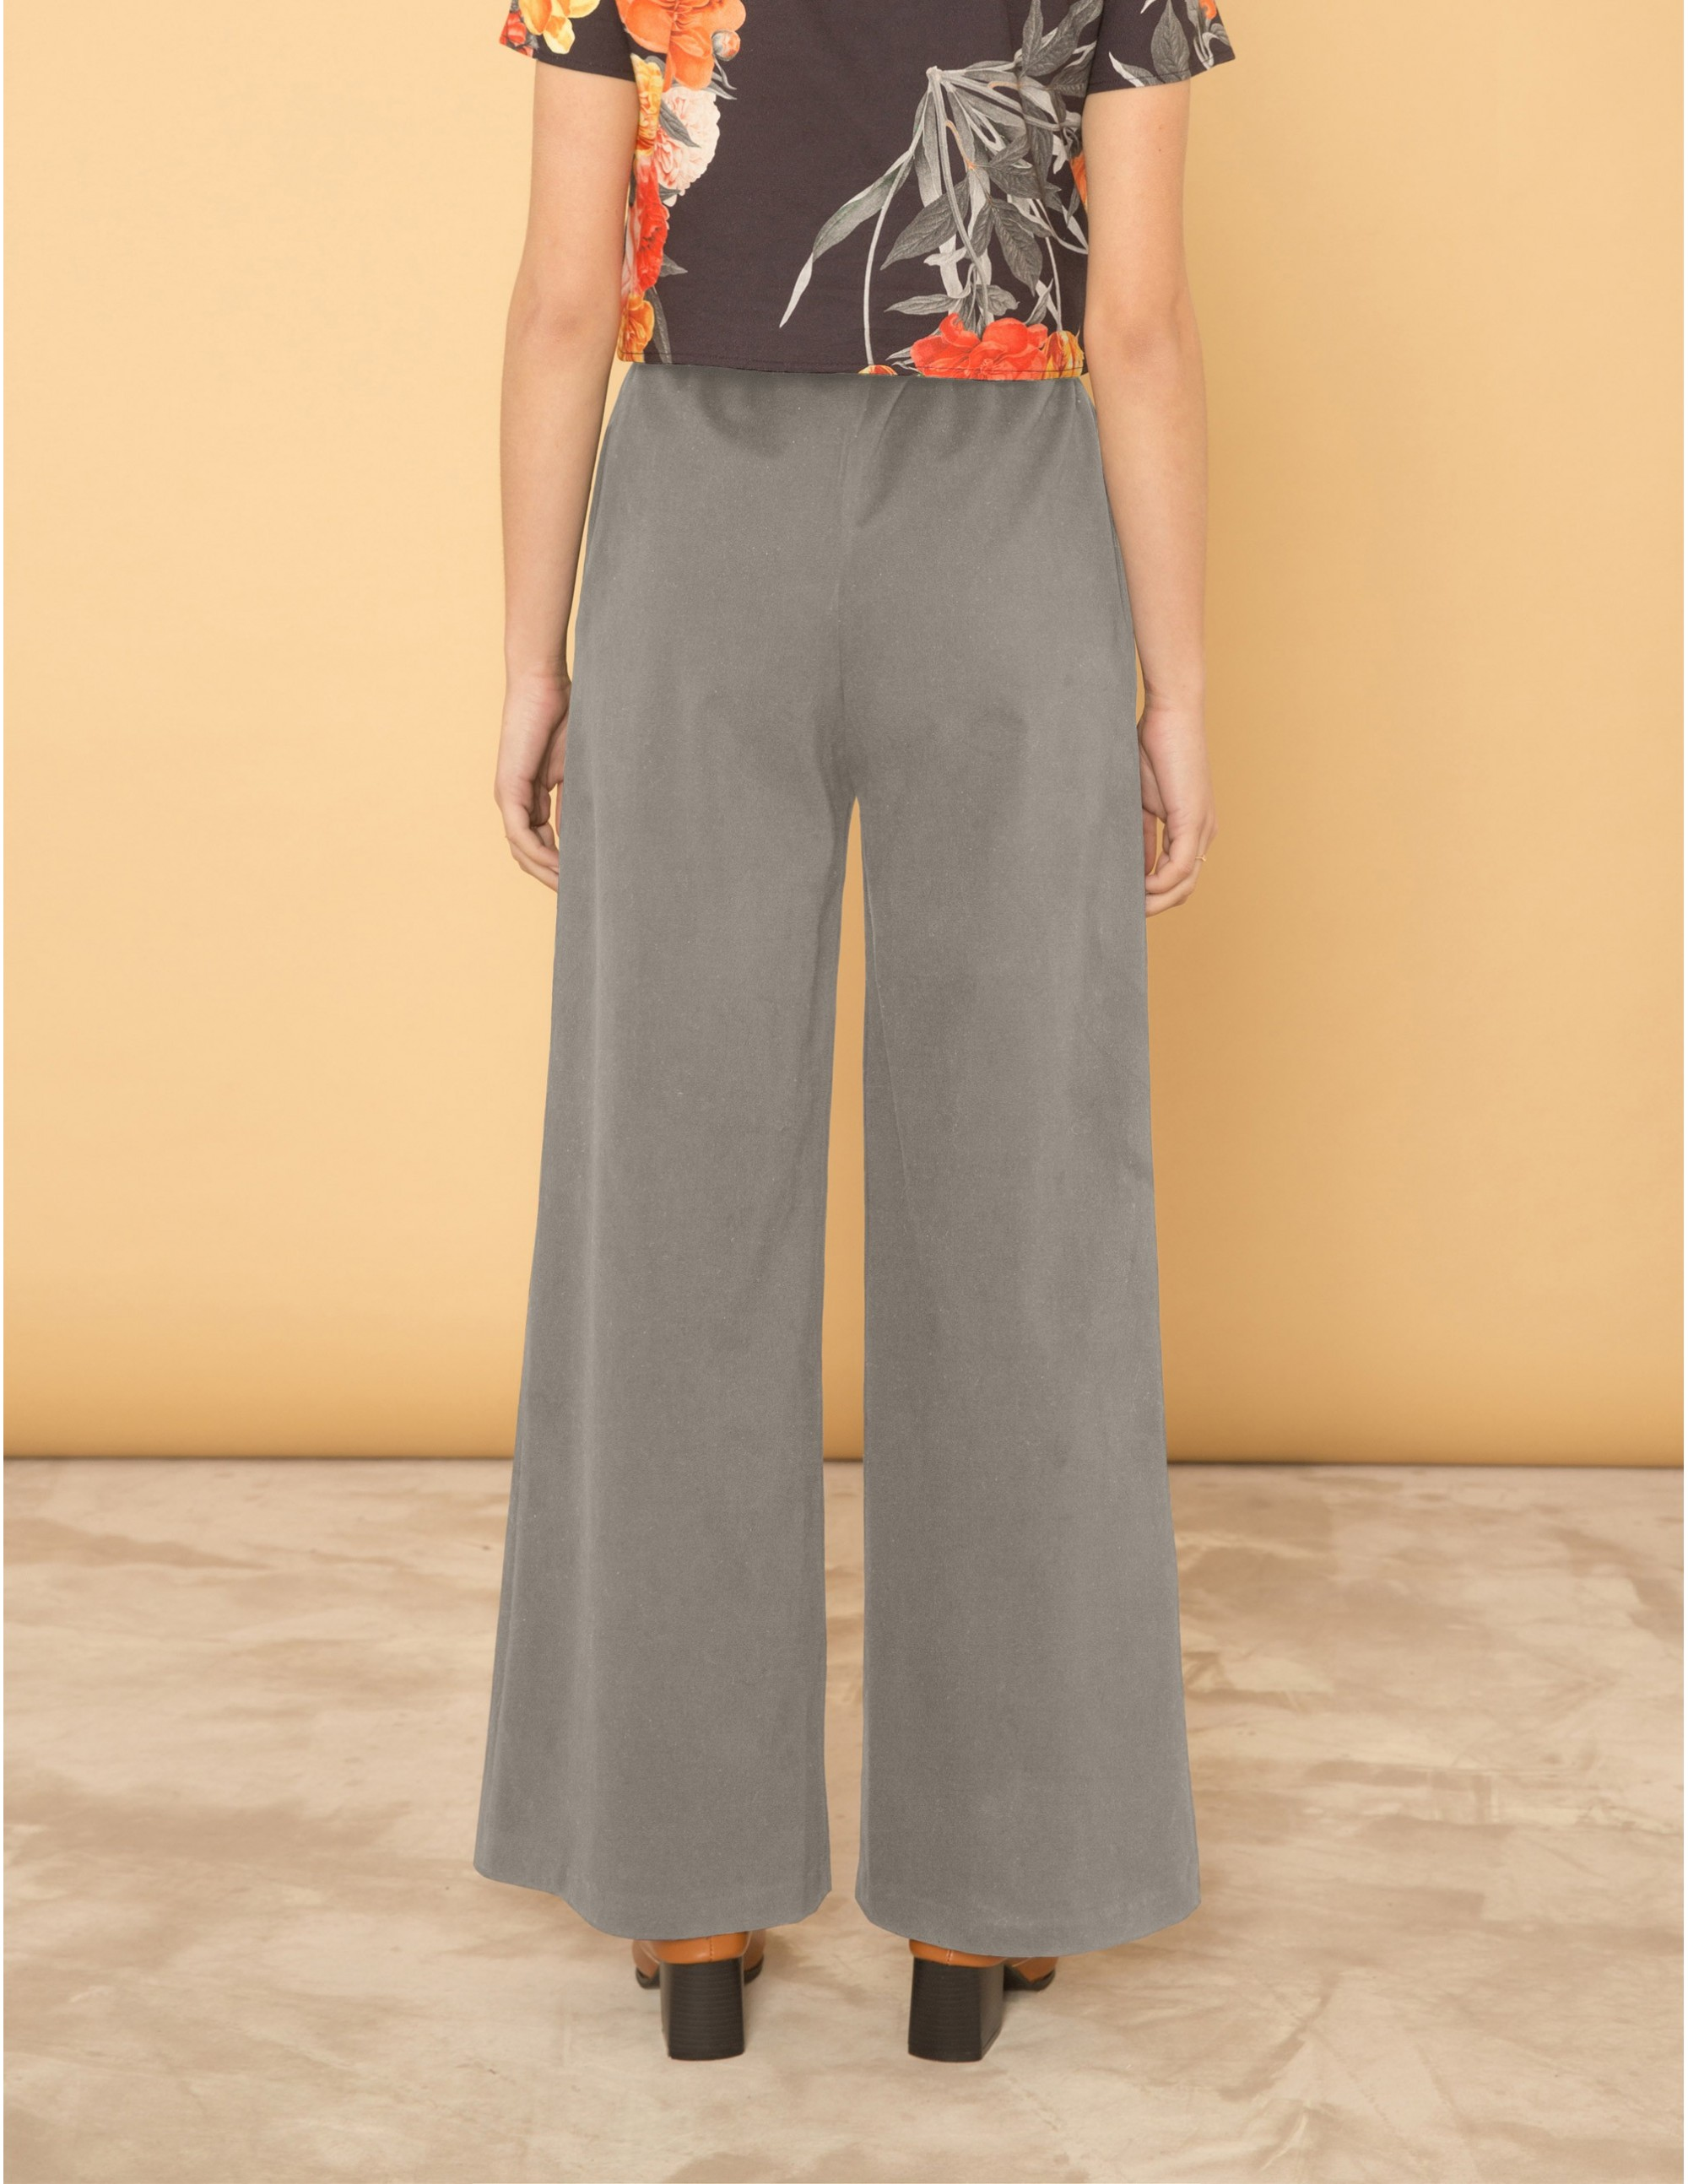 PROJECTION pantalones - STEEL MOON